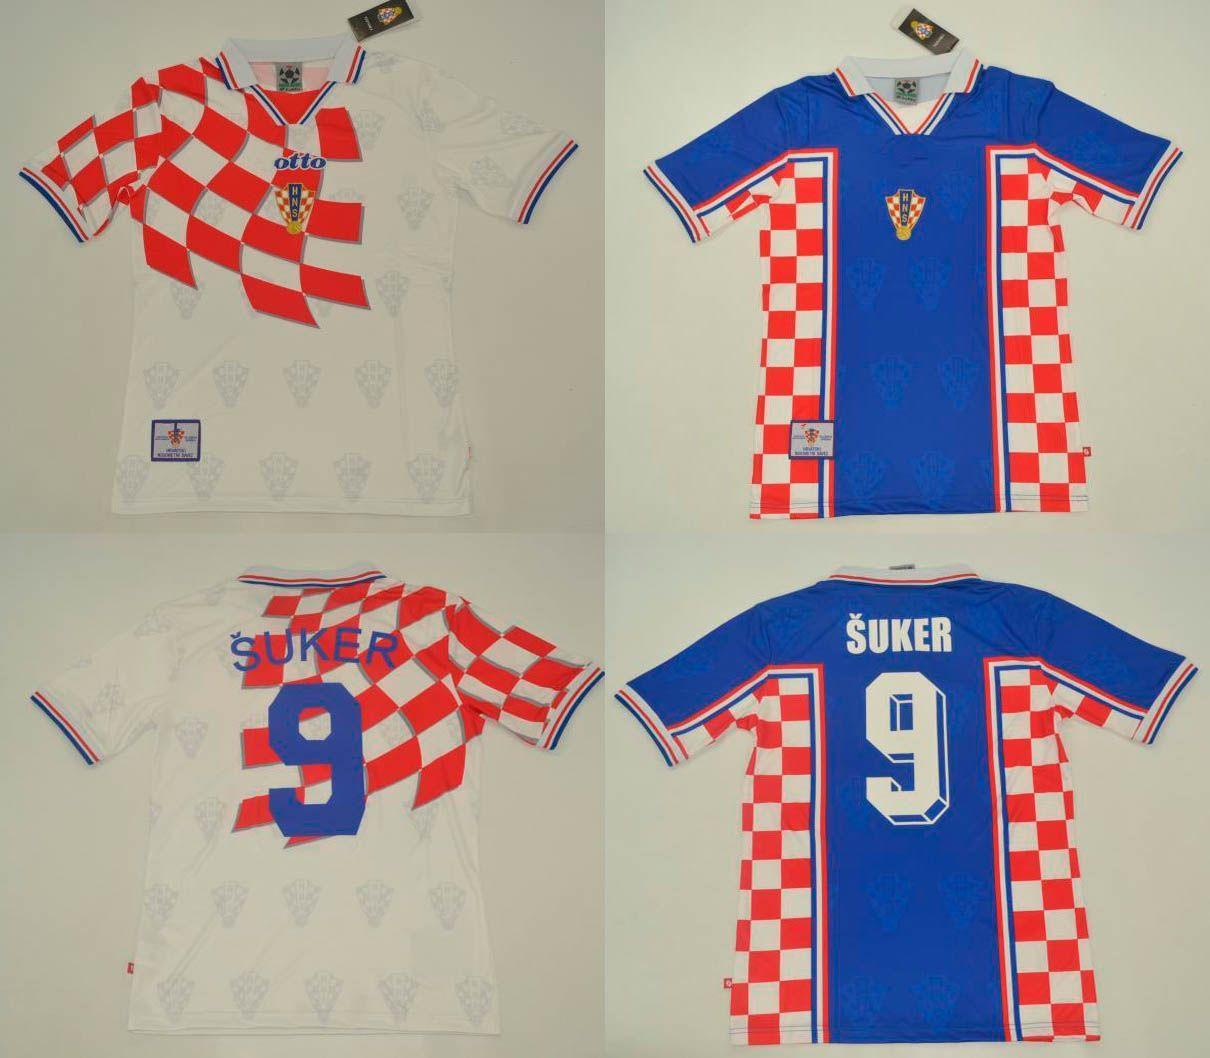 1df0c85ab 2019 1998 Croatiaes Soccer Jersey 98 BOBAN SUKER Retro Football Shirts Top  Thai Quality Football Tops Hrvatska World Cup 1994 Home Away Shirt From ...